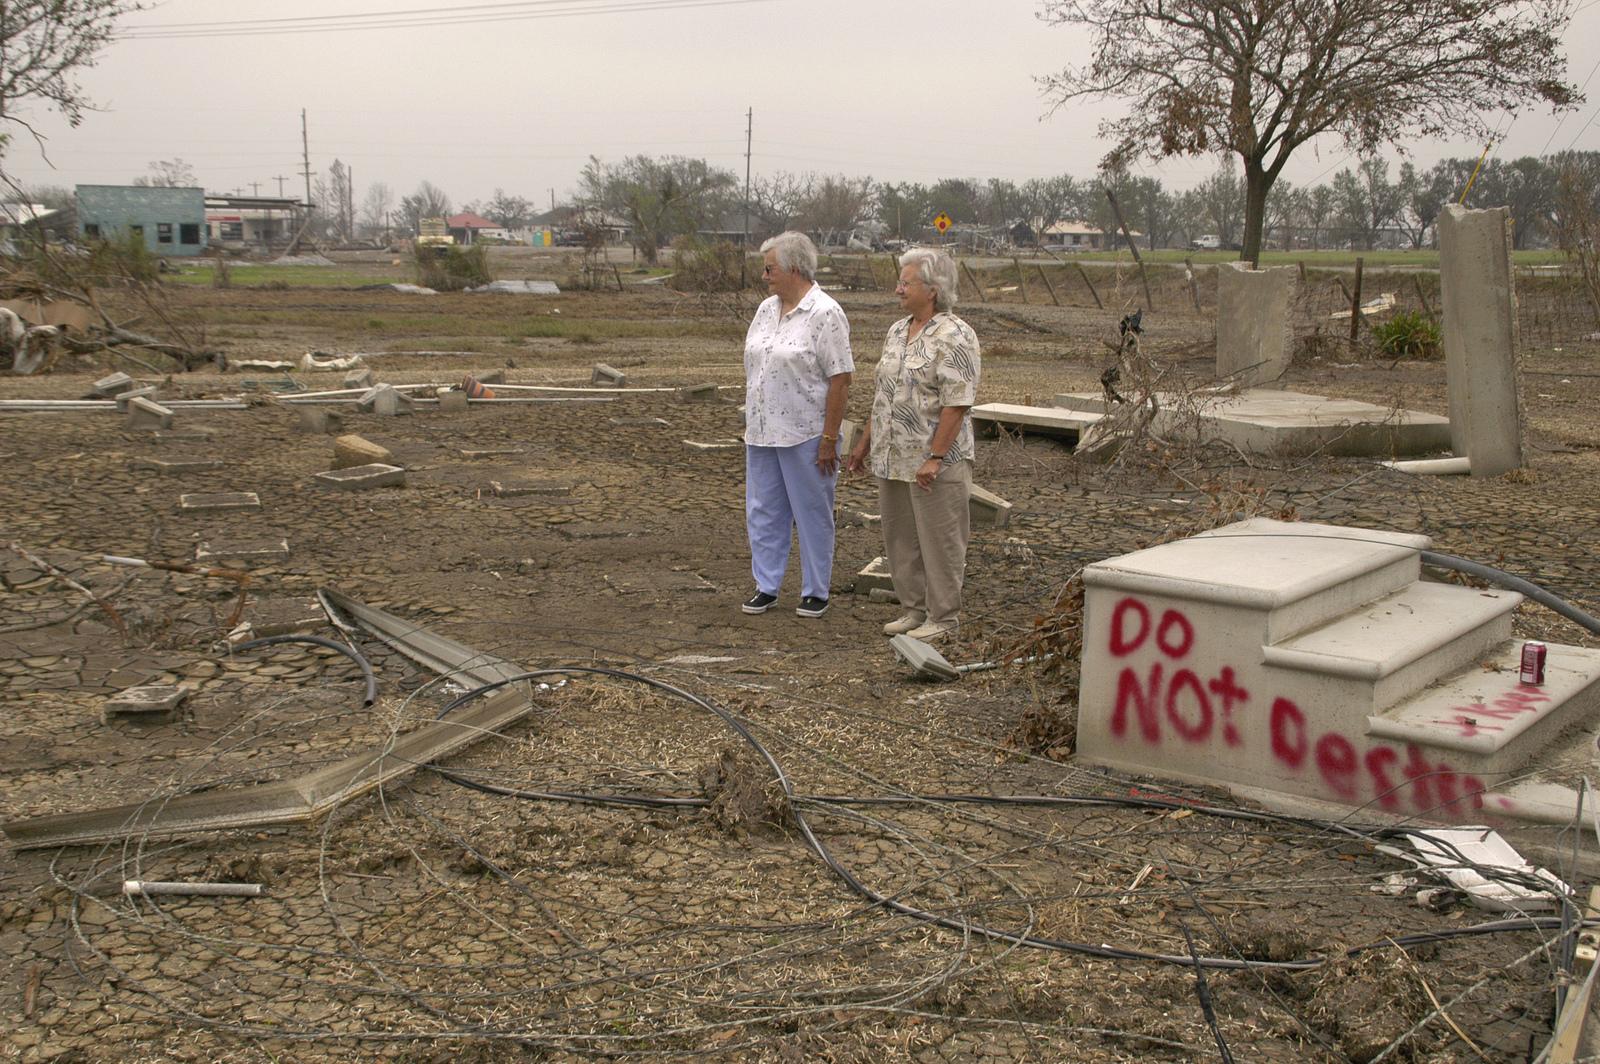 [Hurricane Rita] Cameron, LA, 11-10-05 -- Beulah Boudreaux and Hazel Preston look at the area where their home of 60 years once stood, before Hurricane Rita.  Hurricane Rita left many people homeless that are applying to FEMA for help.  MARVIN NAUMAN/FEMA photo